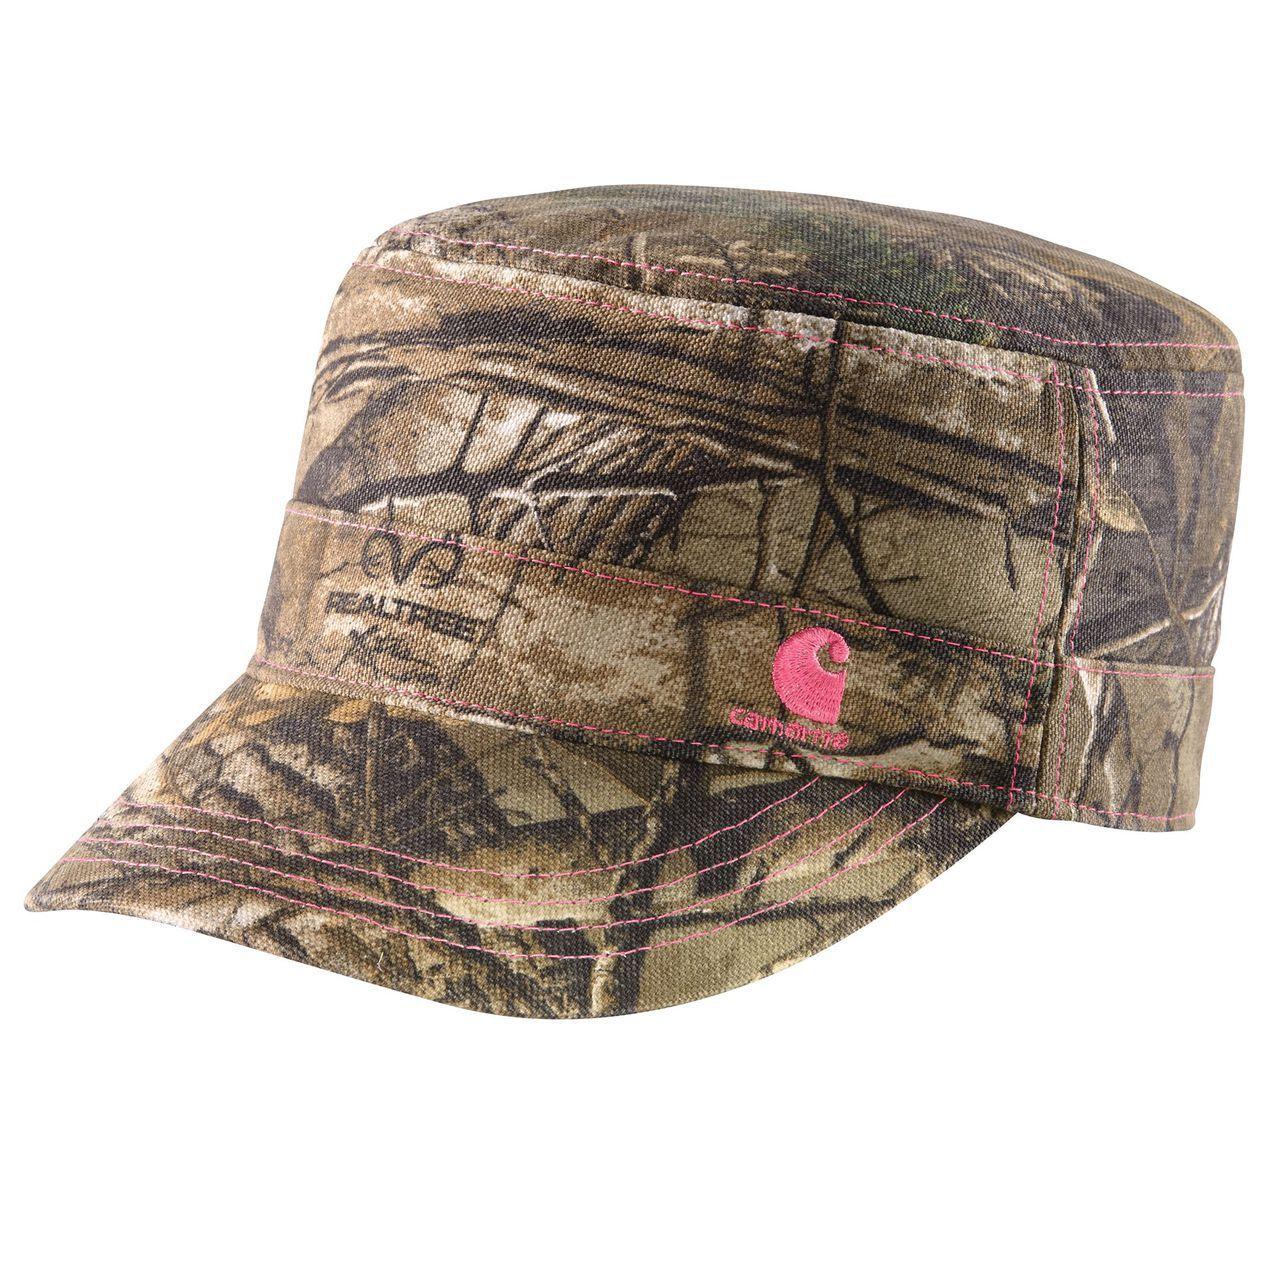 7a3c9683a69 CAMO HENDRIE MILITARY CAP - The Brown Duck